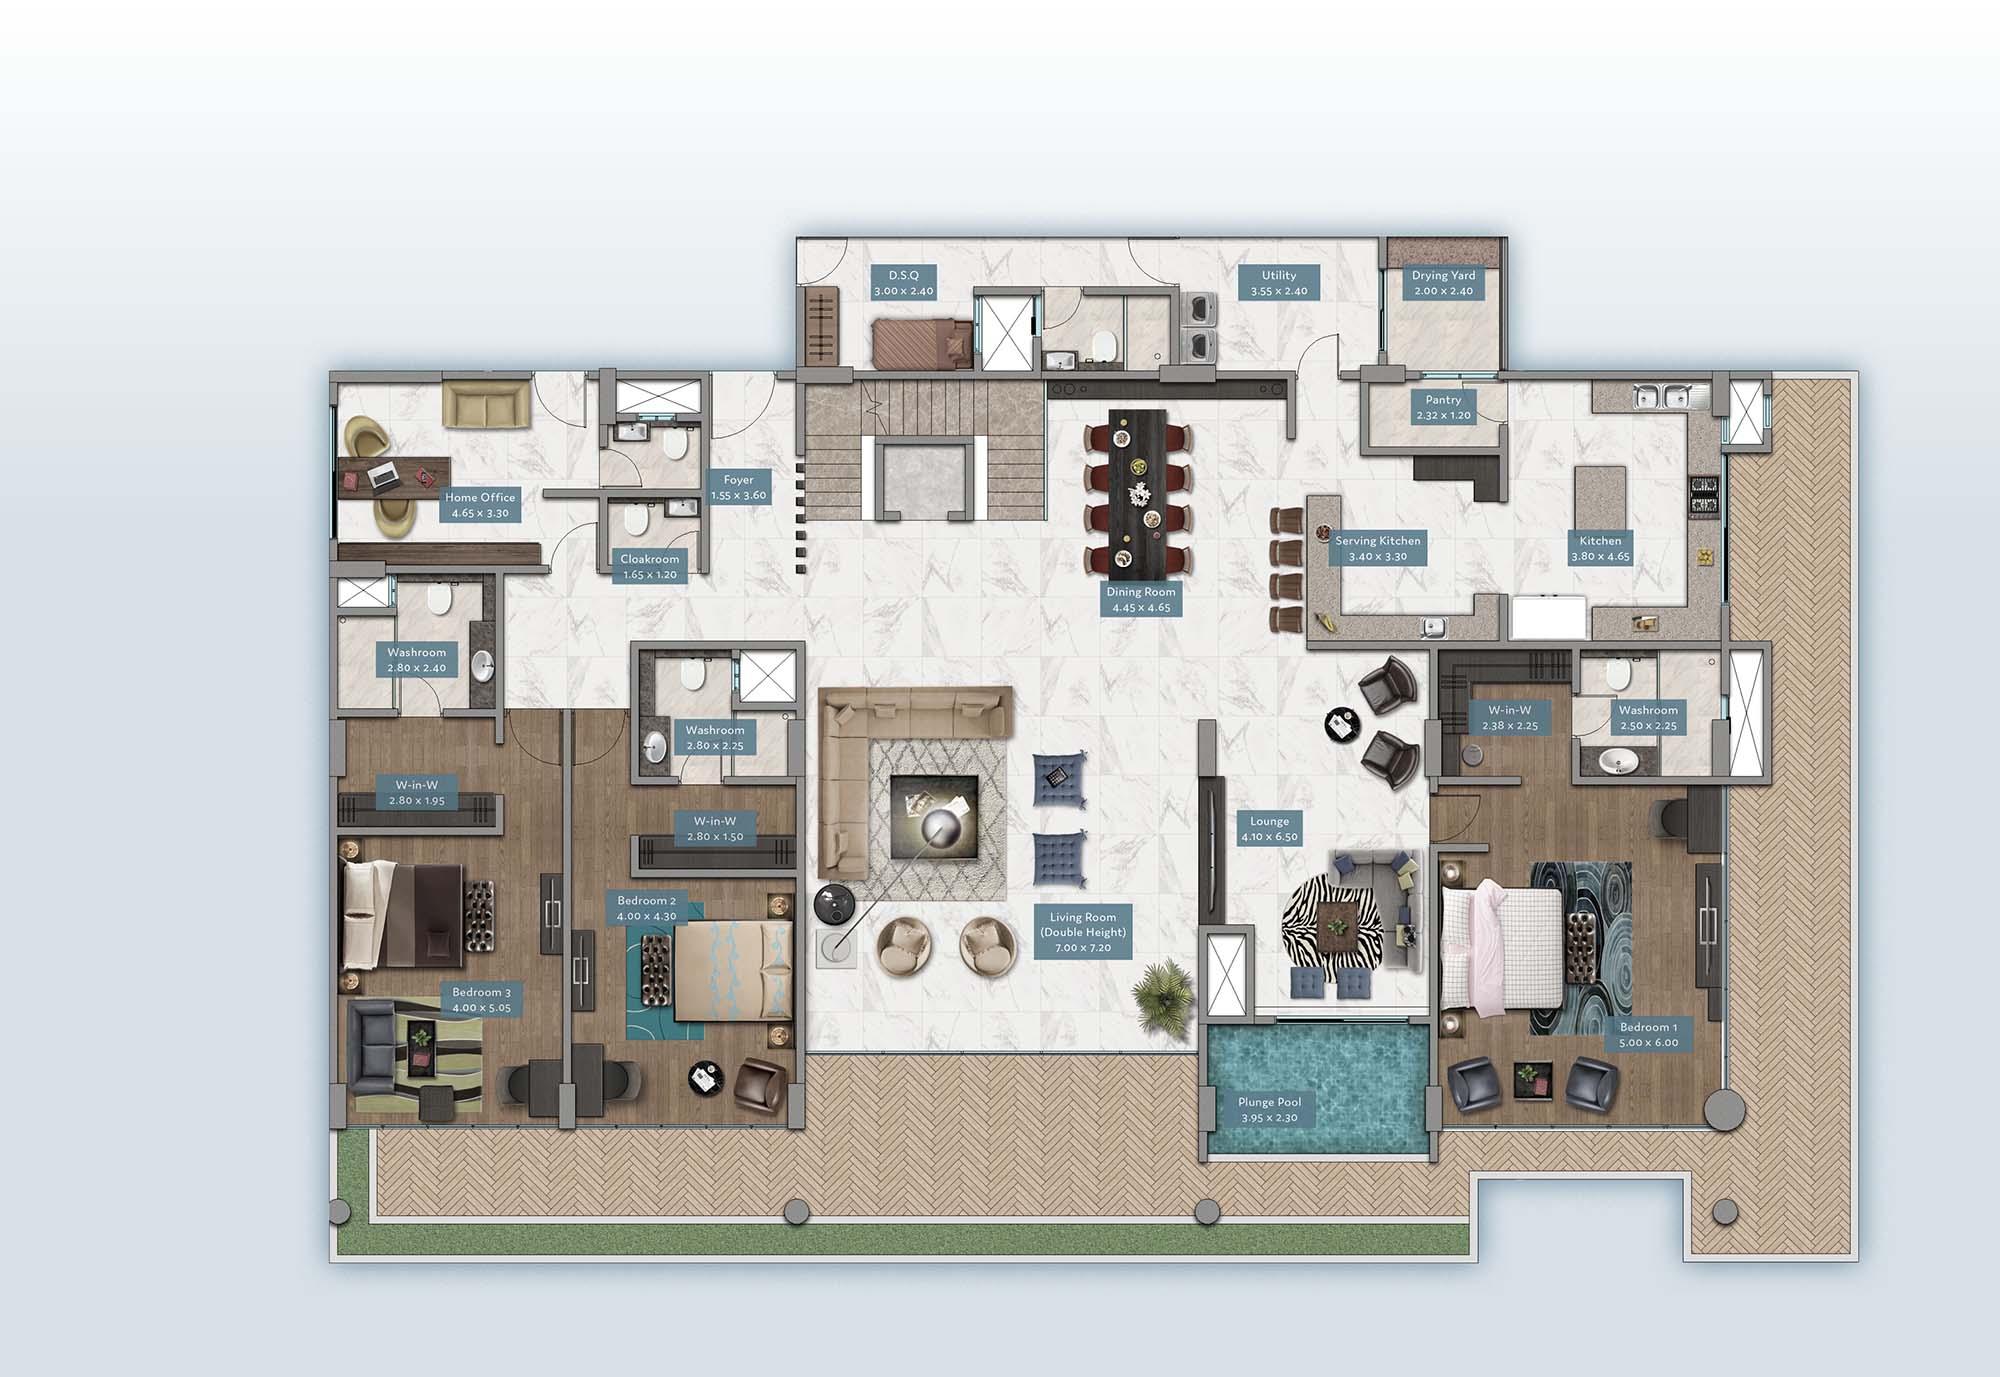 Shanzu View Penthouse | Floorplan | No. P1 & P6 - Level 1